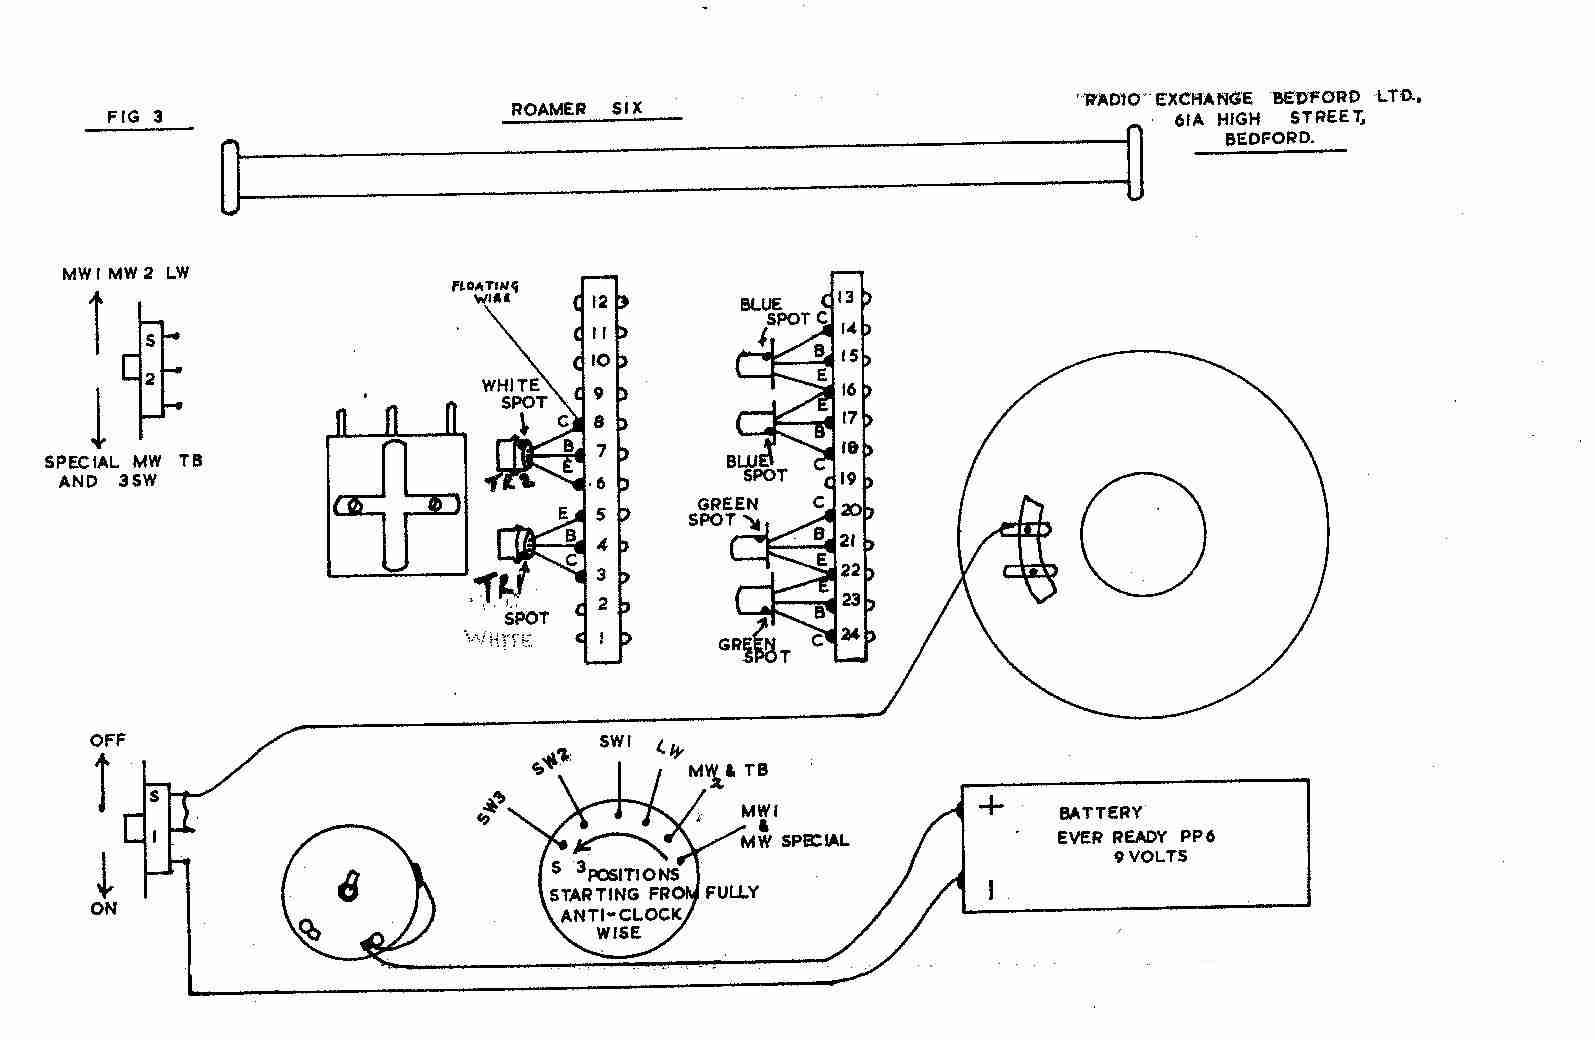 Vintage Radio And Electronics Radio Exchange Bedford